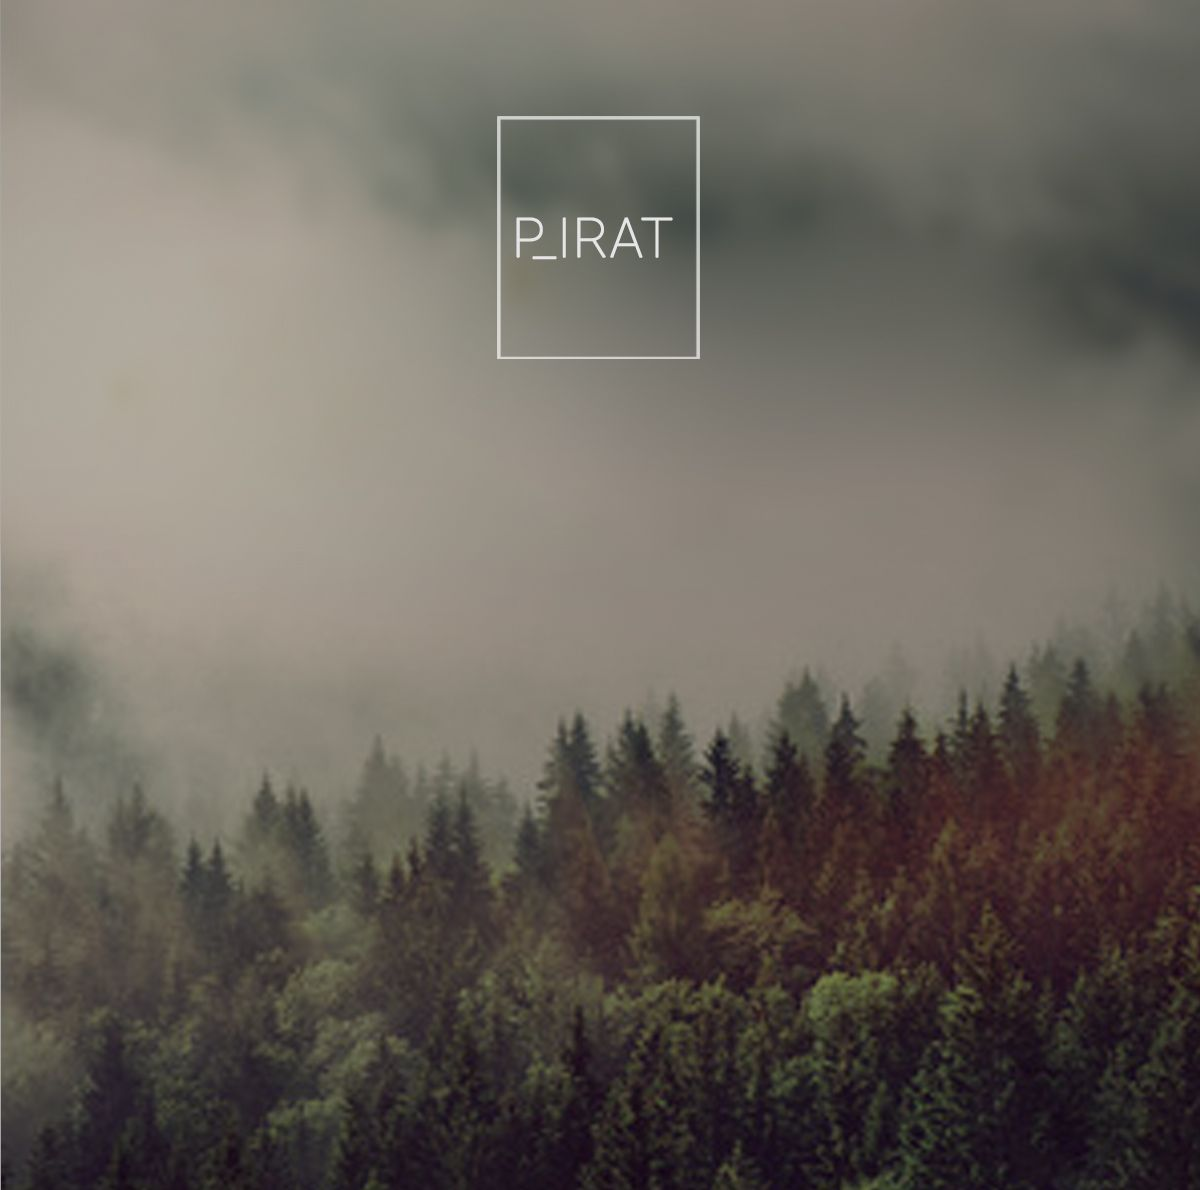 Pirat production logo concept by christine benz